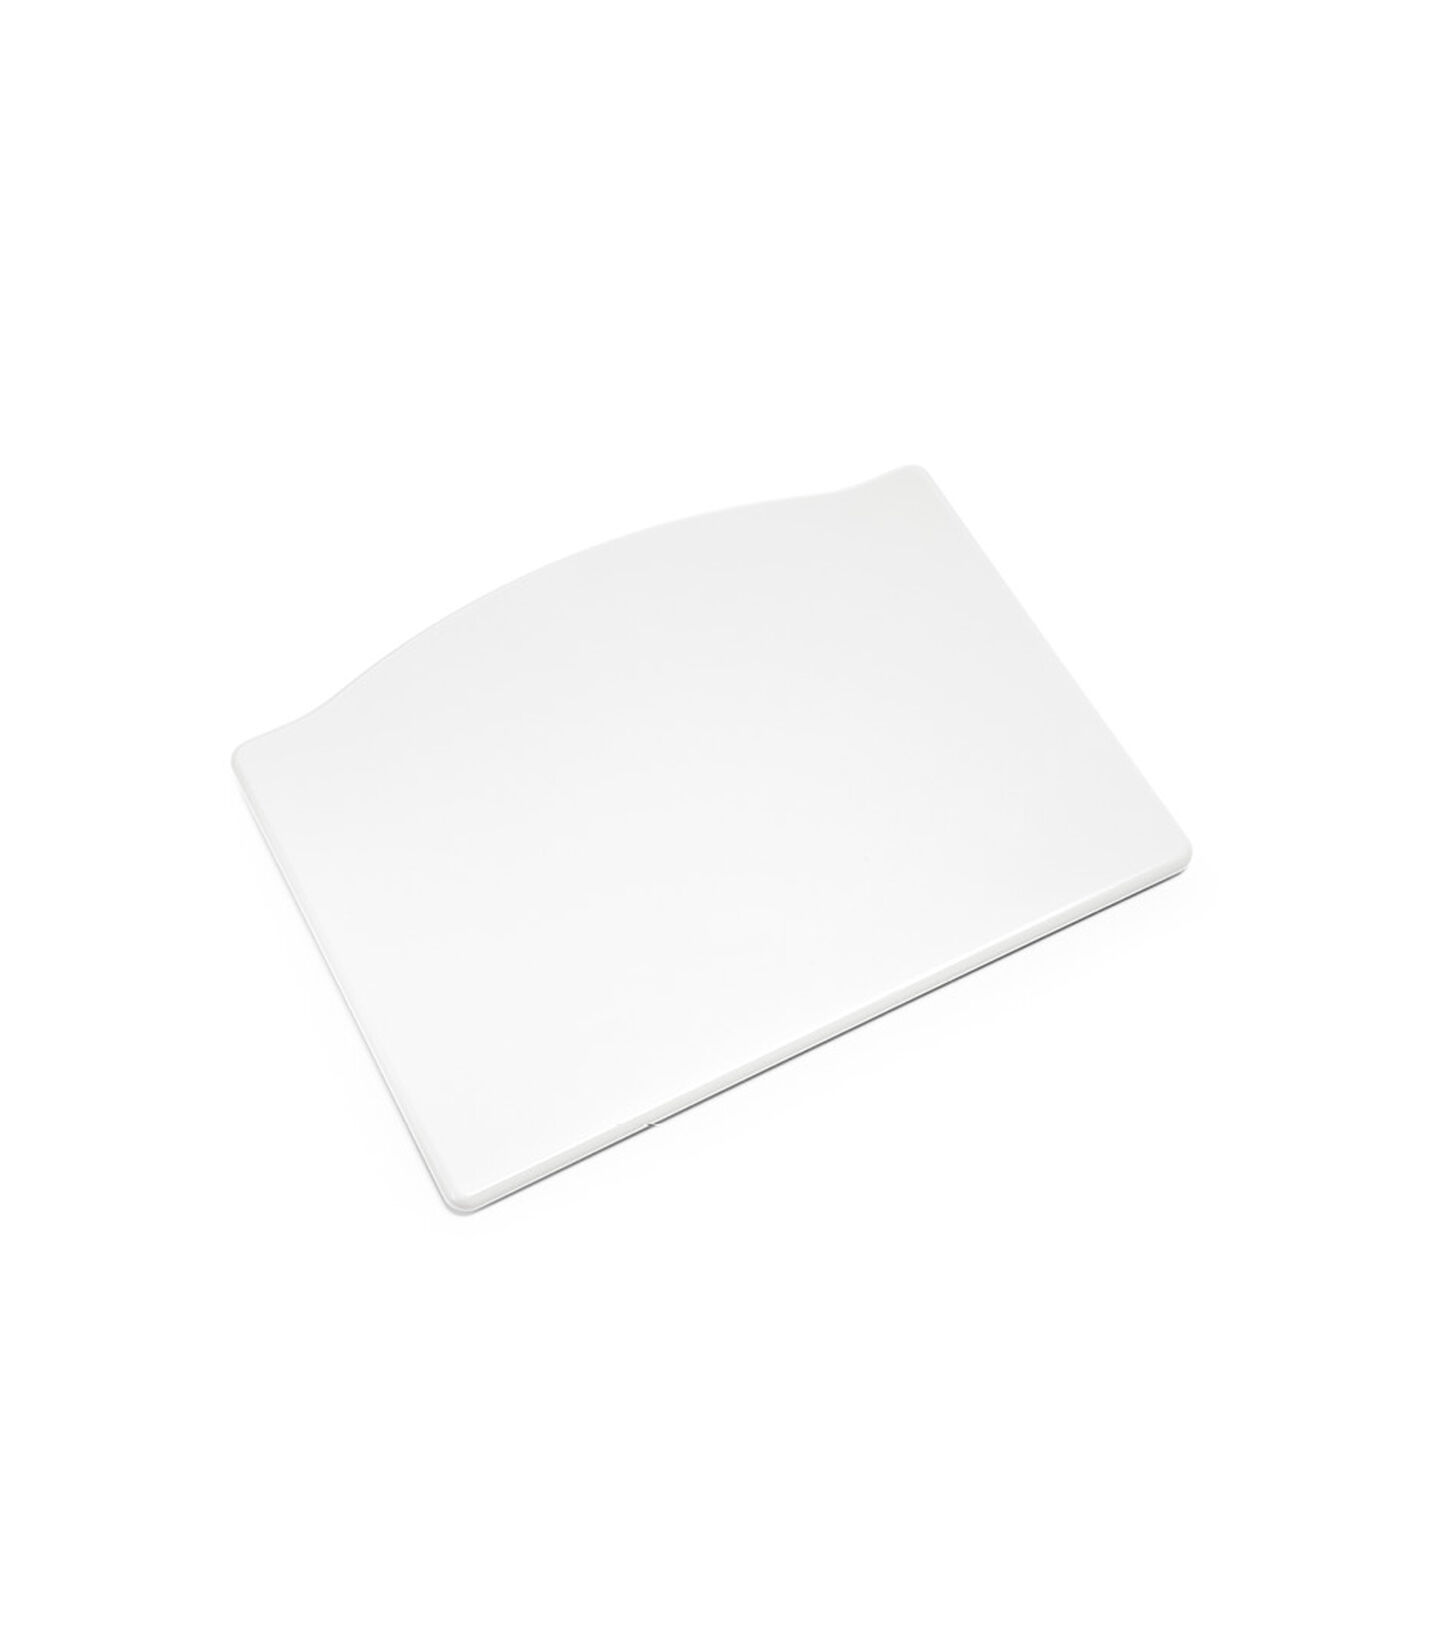 Tripp Trapp® Footplate Bianco, Bianco, mainview view 2